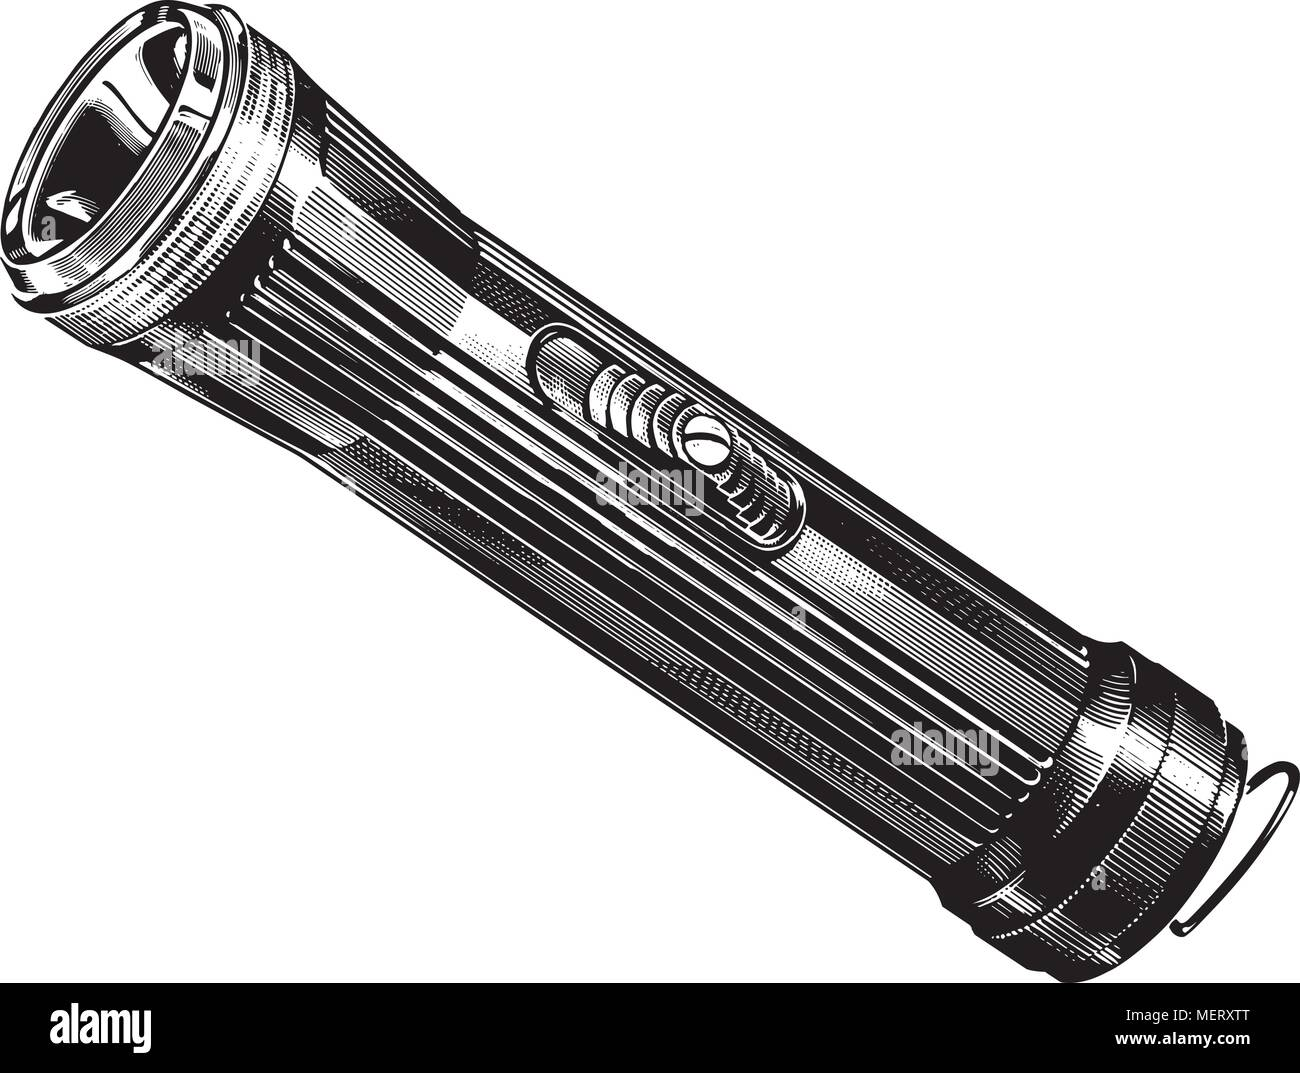 Flashlight - Retro Clipart Illustration - Stock Image